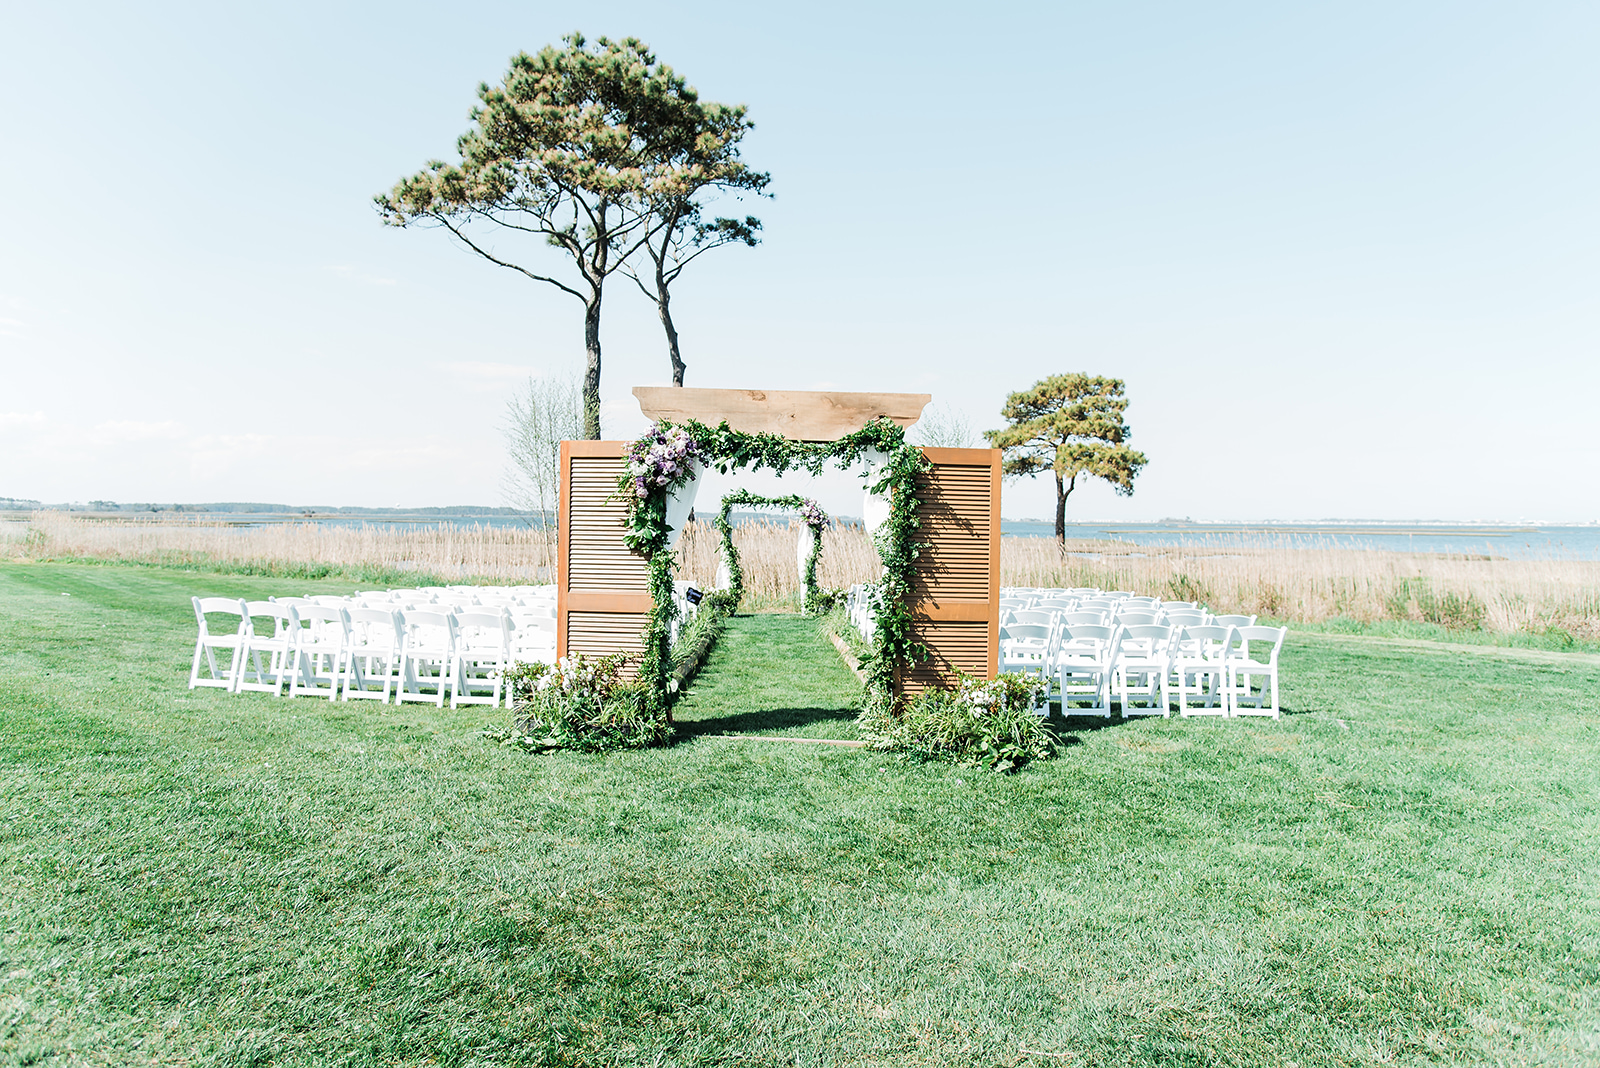 lighthouse_sound_ocean_city_maryland_wedding_ceremony_setup